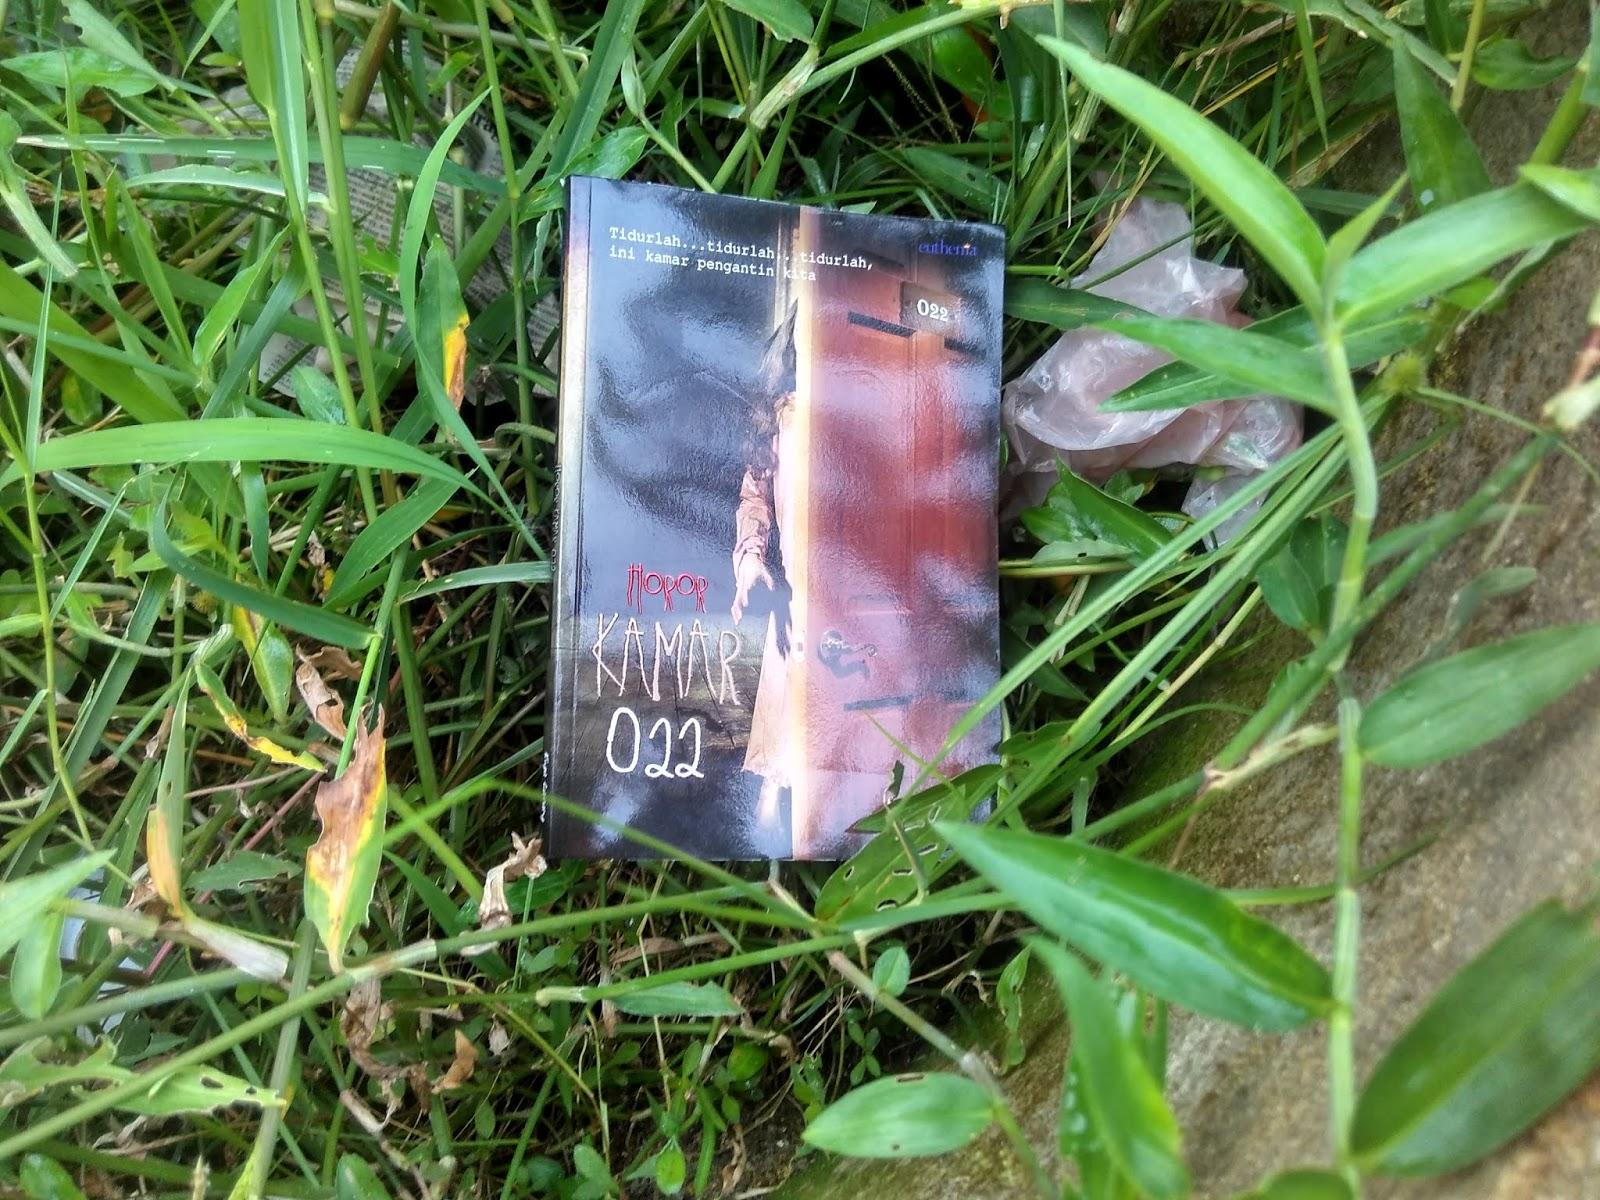 Review Buku Horror Kamar 022 by Kiyu Luxury